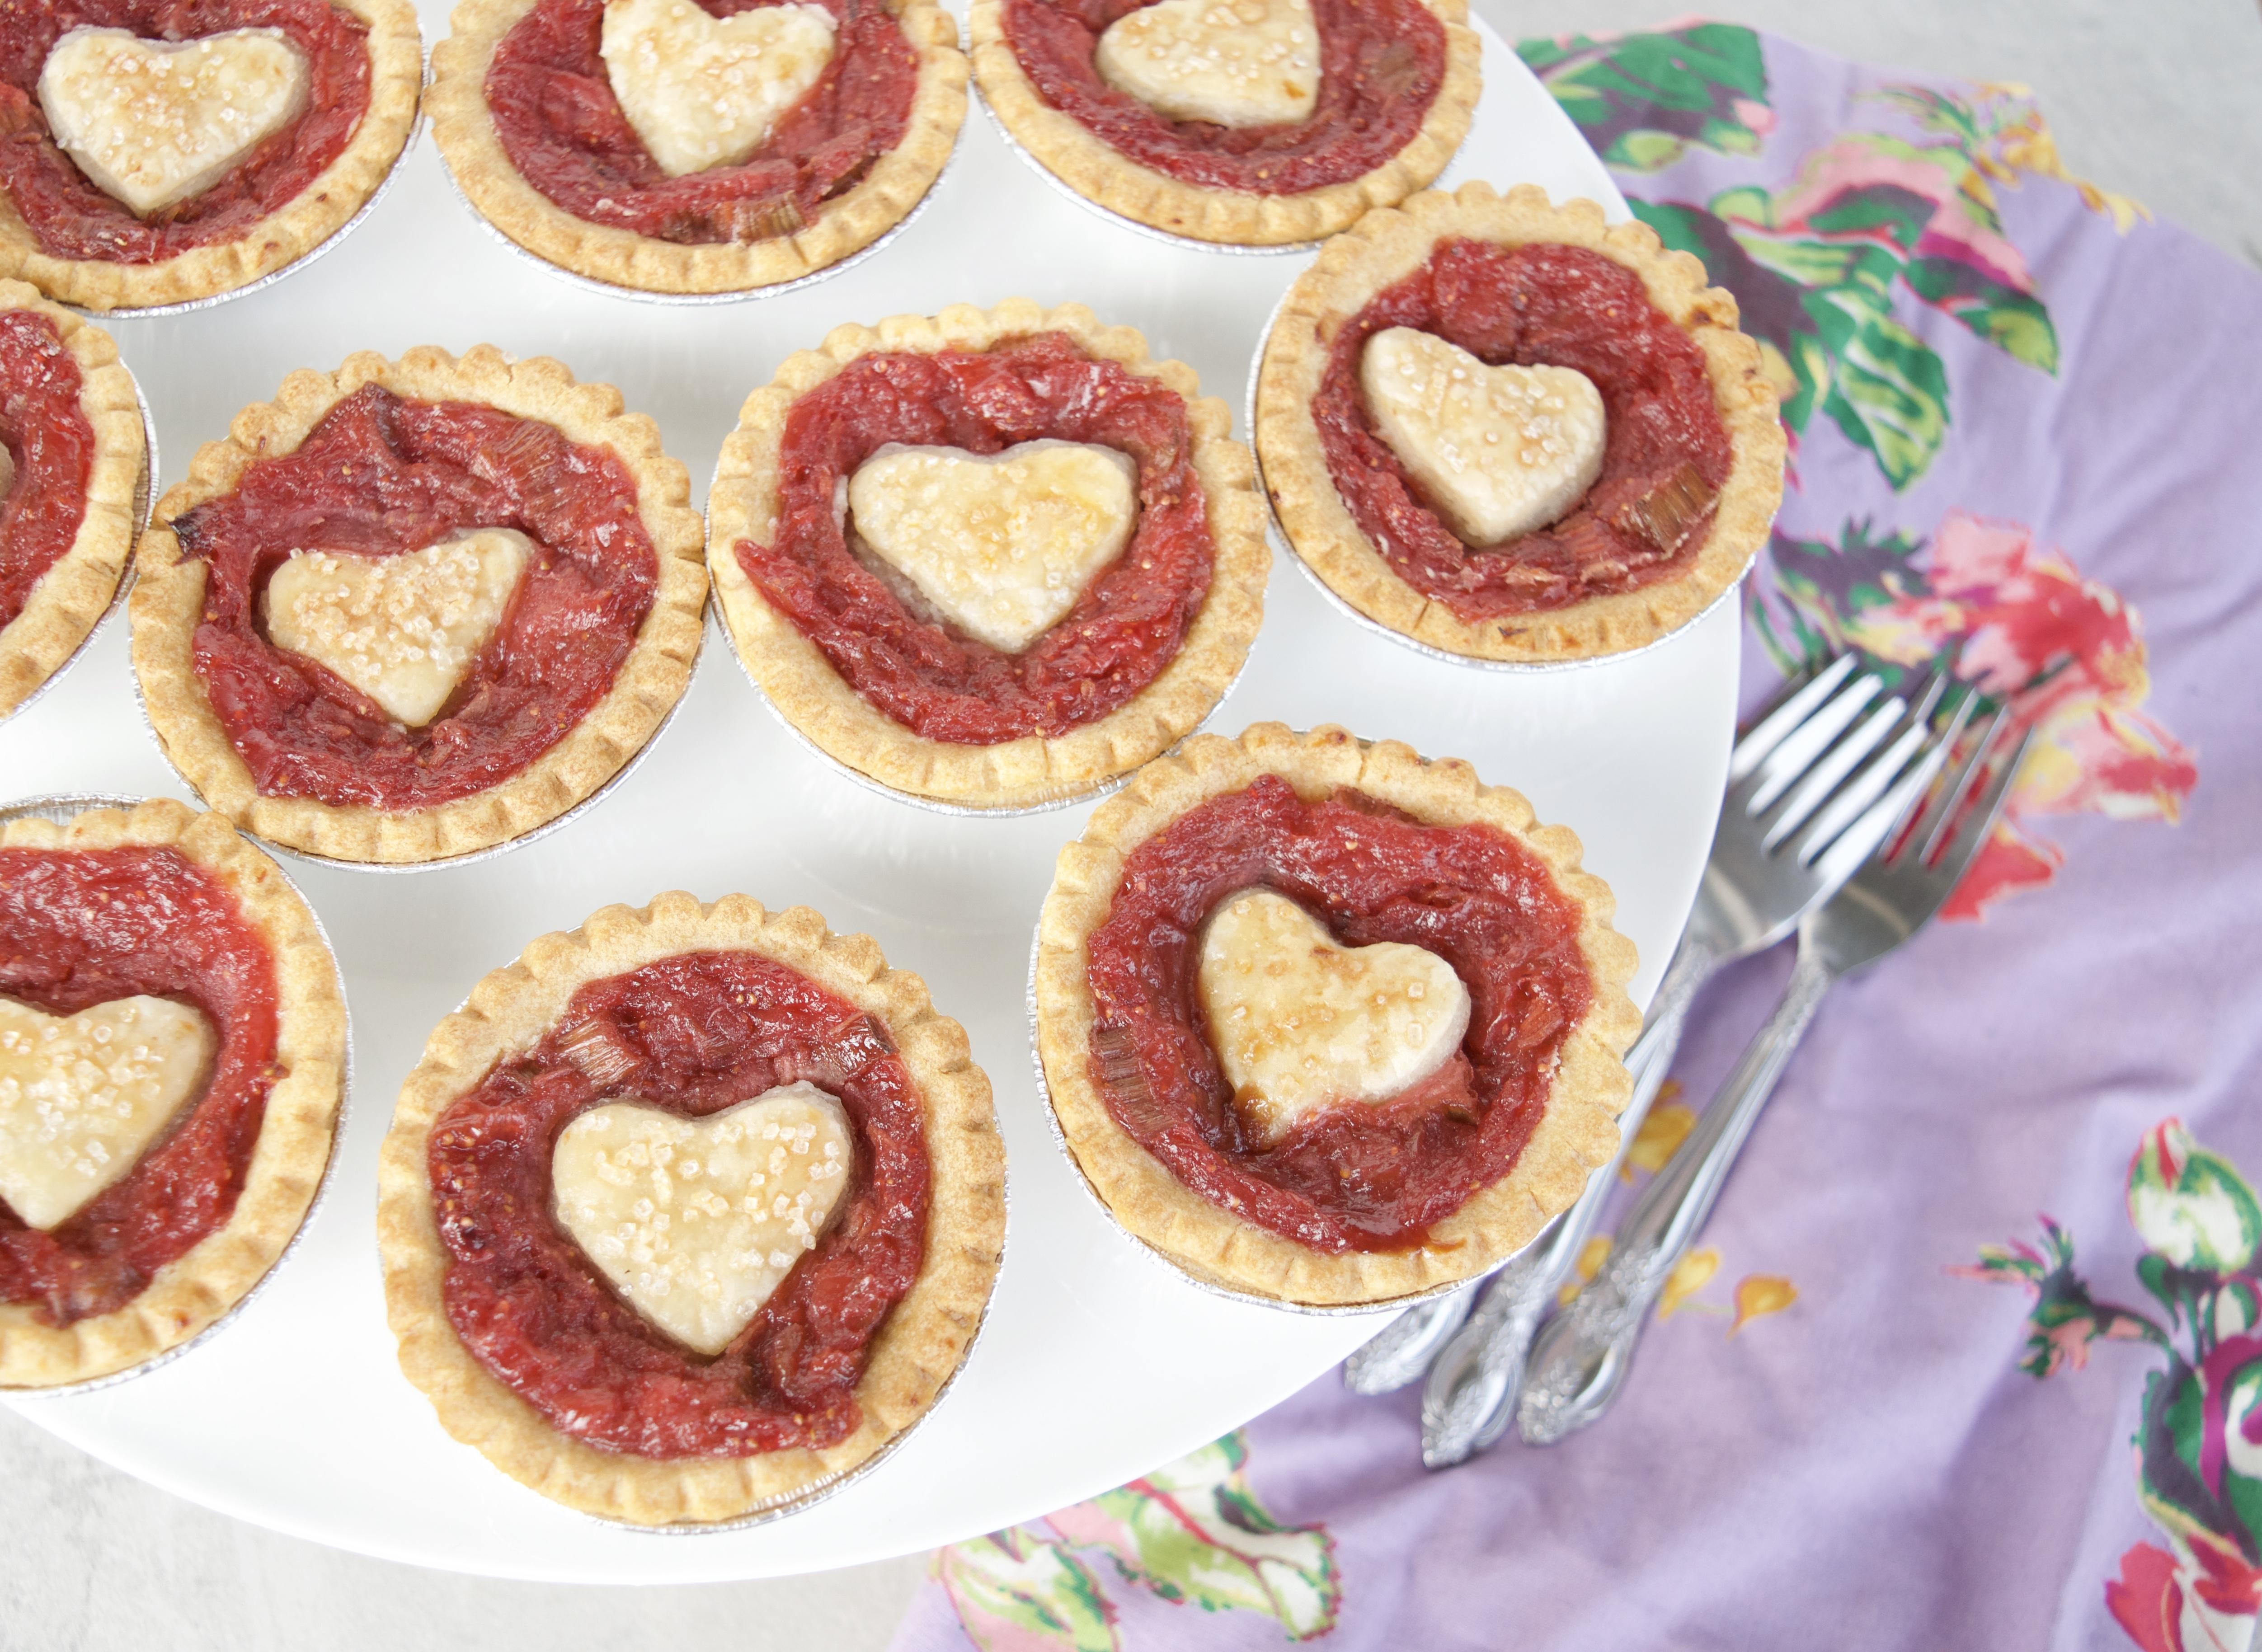 Strawberry rhubarb mini pies